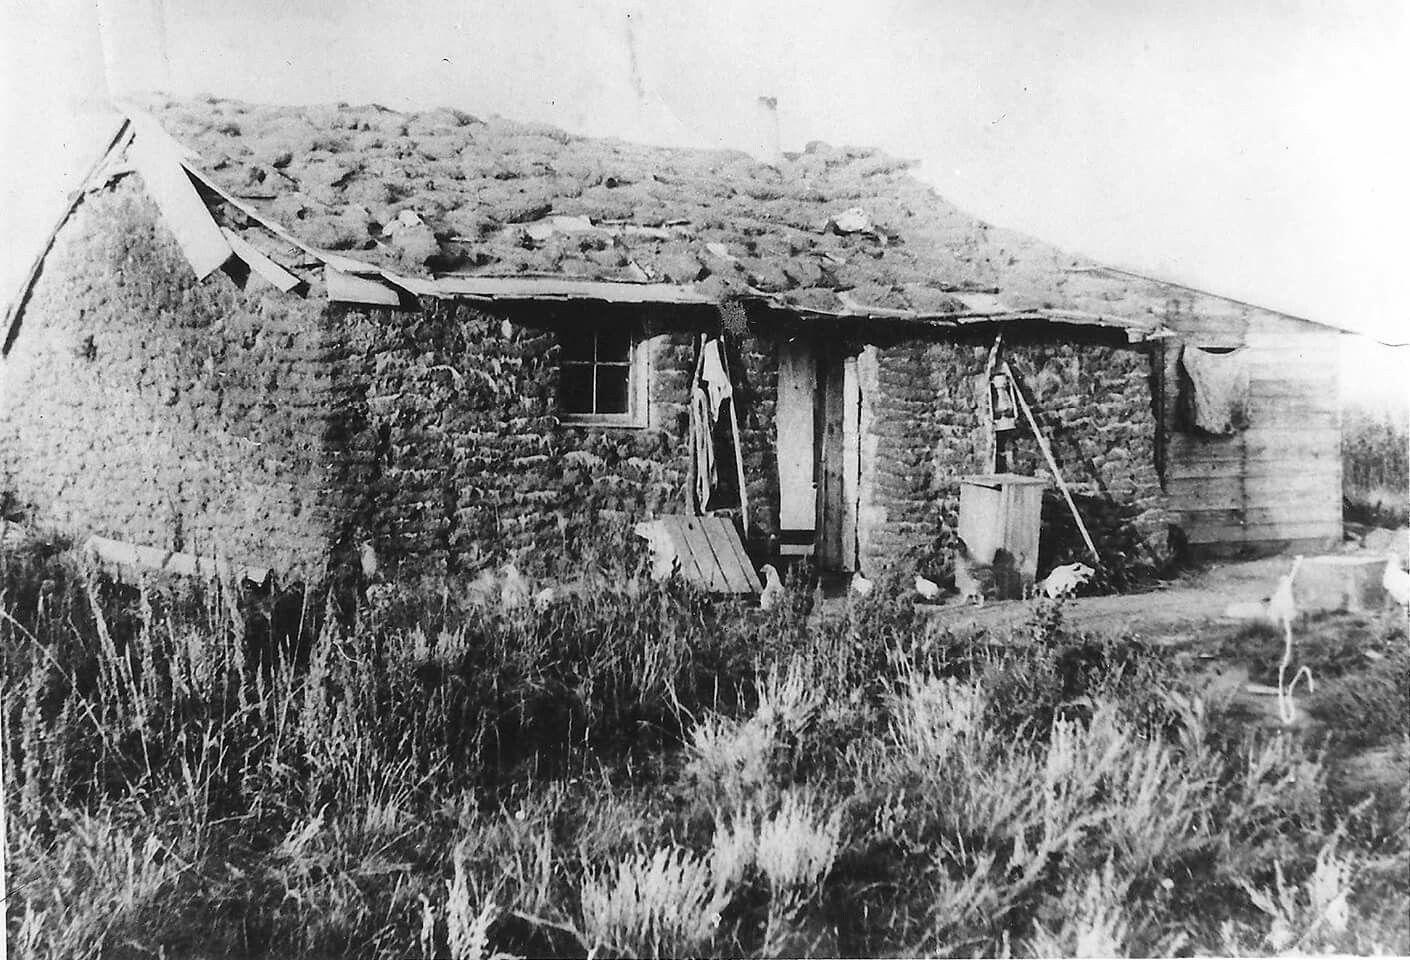 Soddy house near Hamiota, Manitoba 1880s. Vintage Old